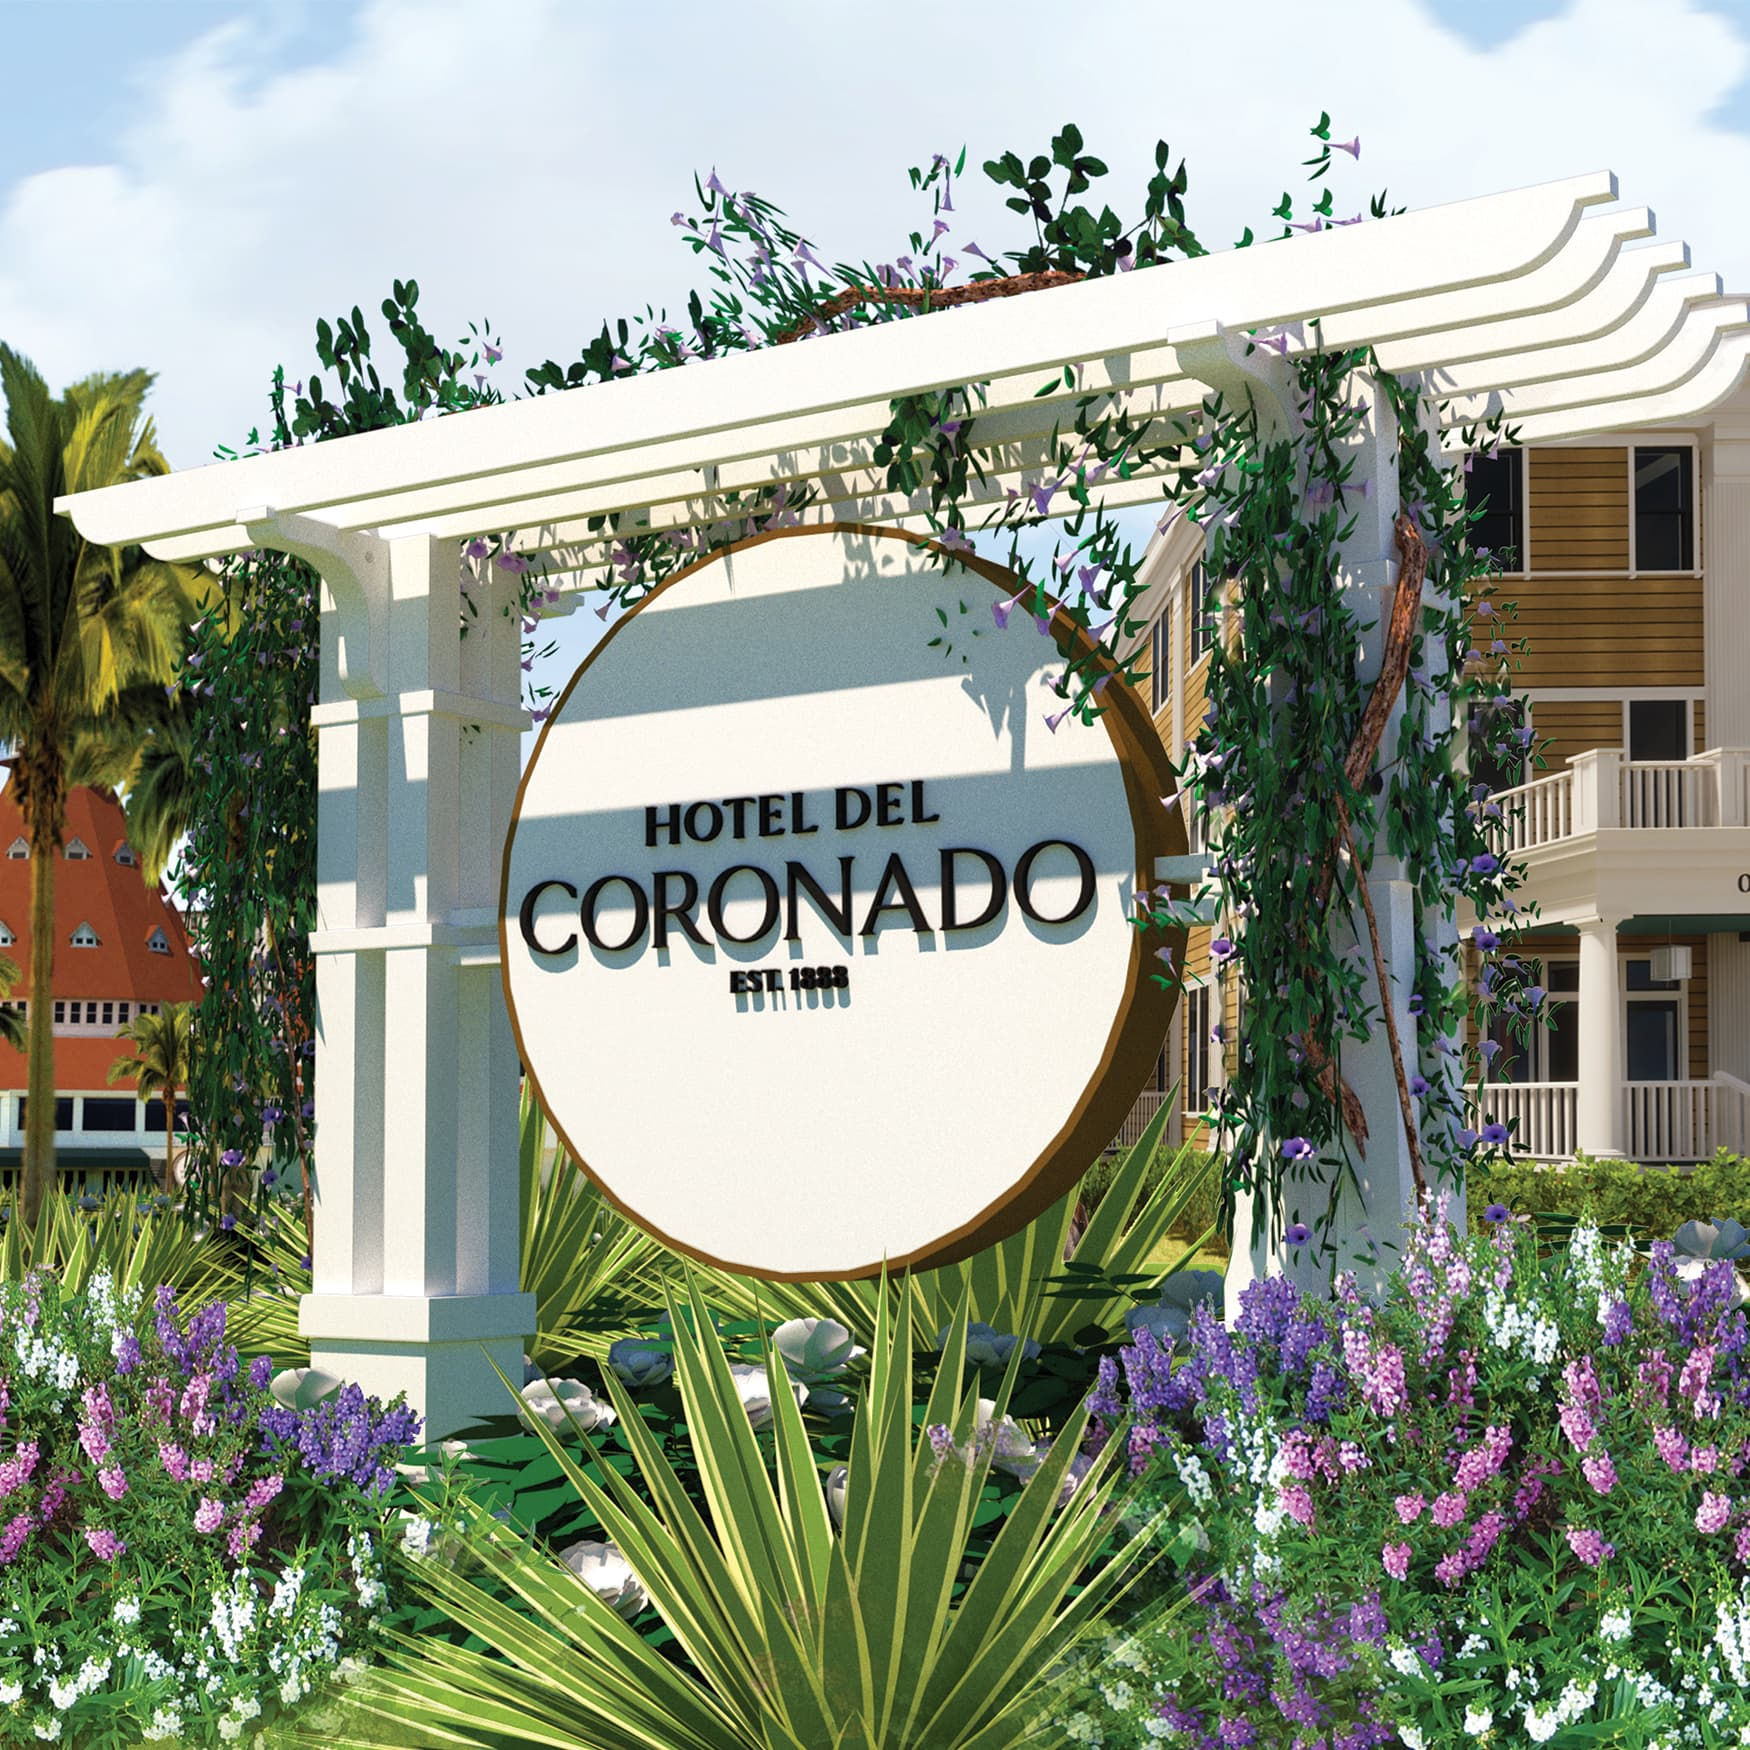 A Hotel del Coronado branded post and panel sign prepared by RSM Design